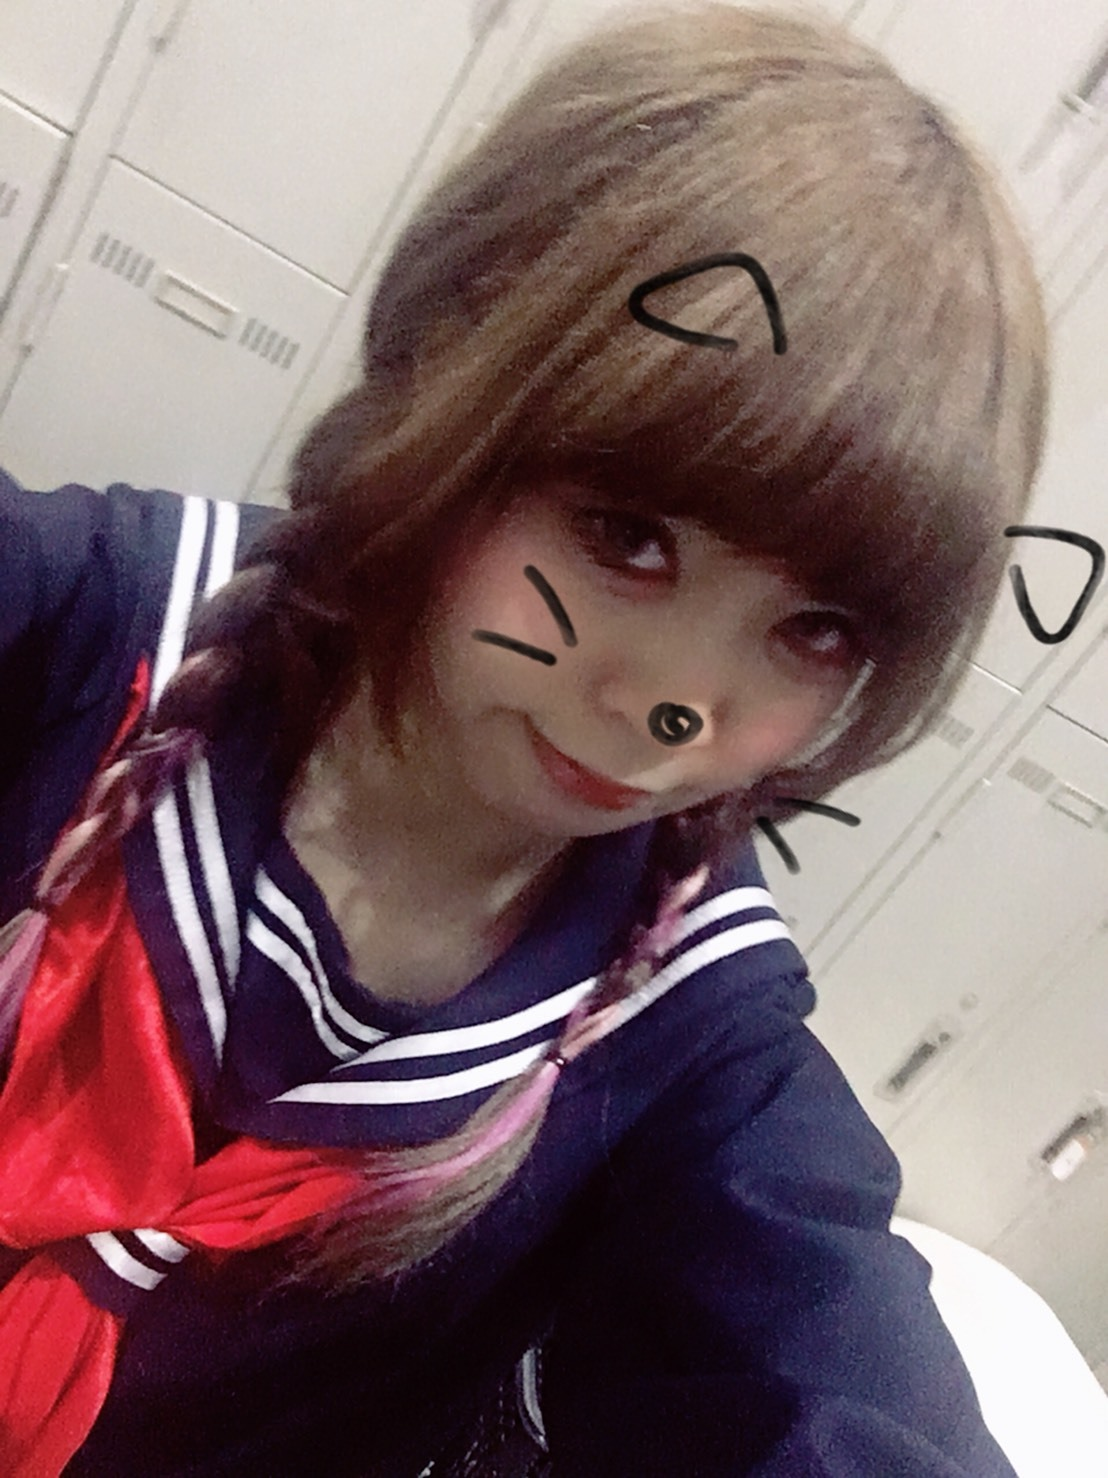 S__31154216.jpg